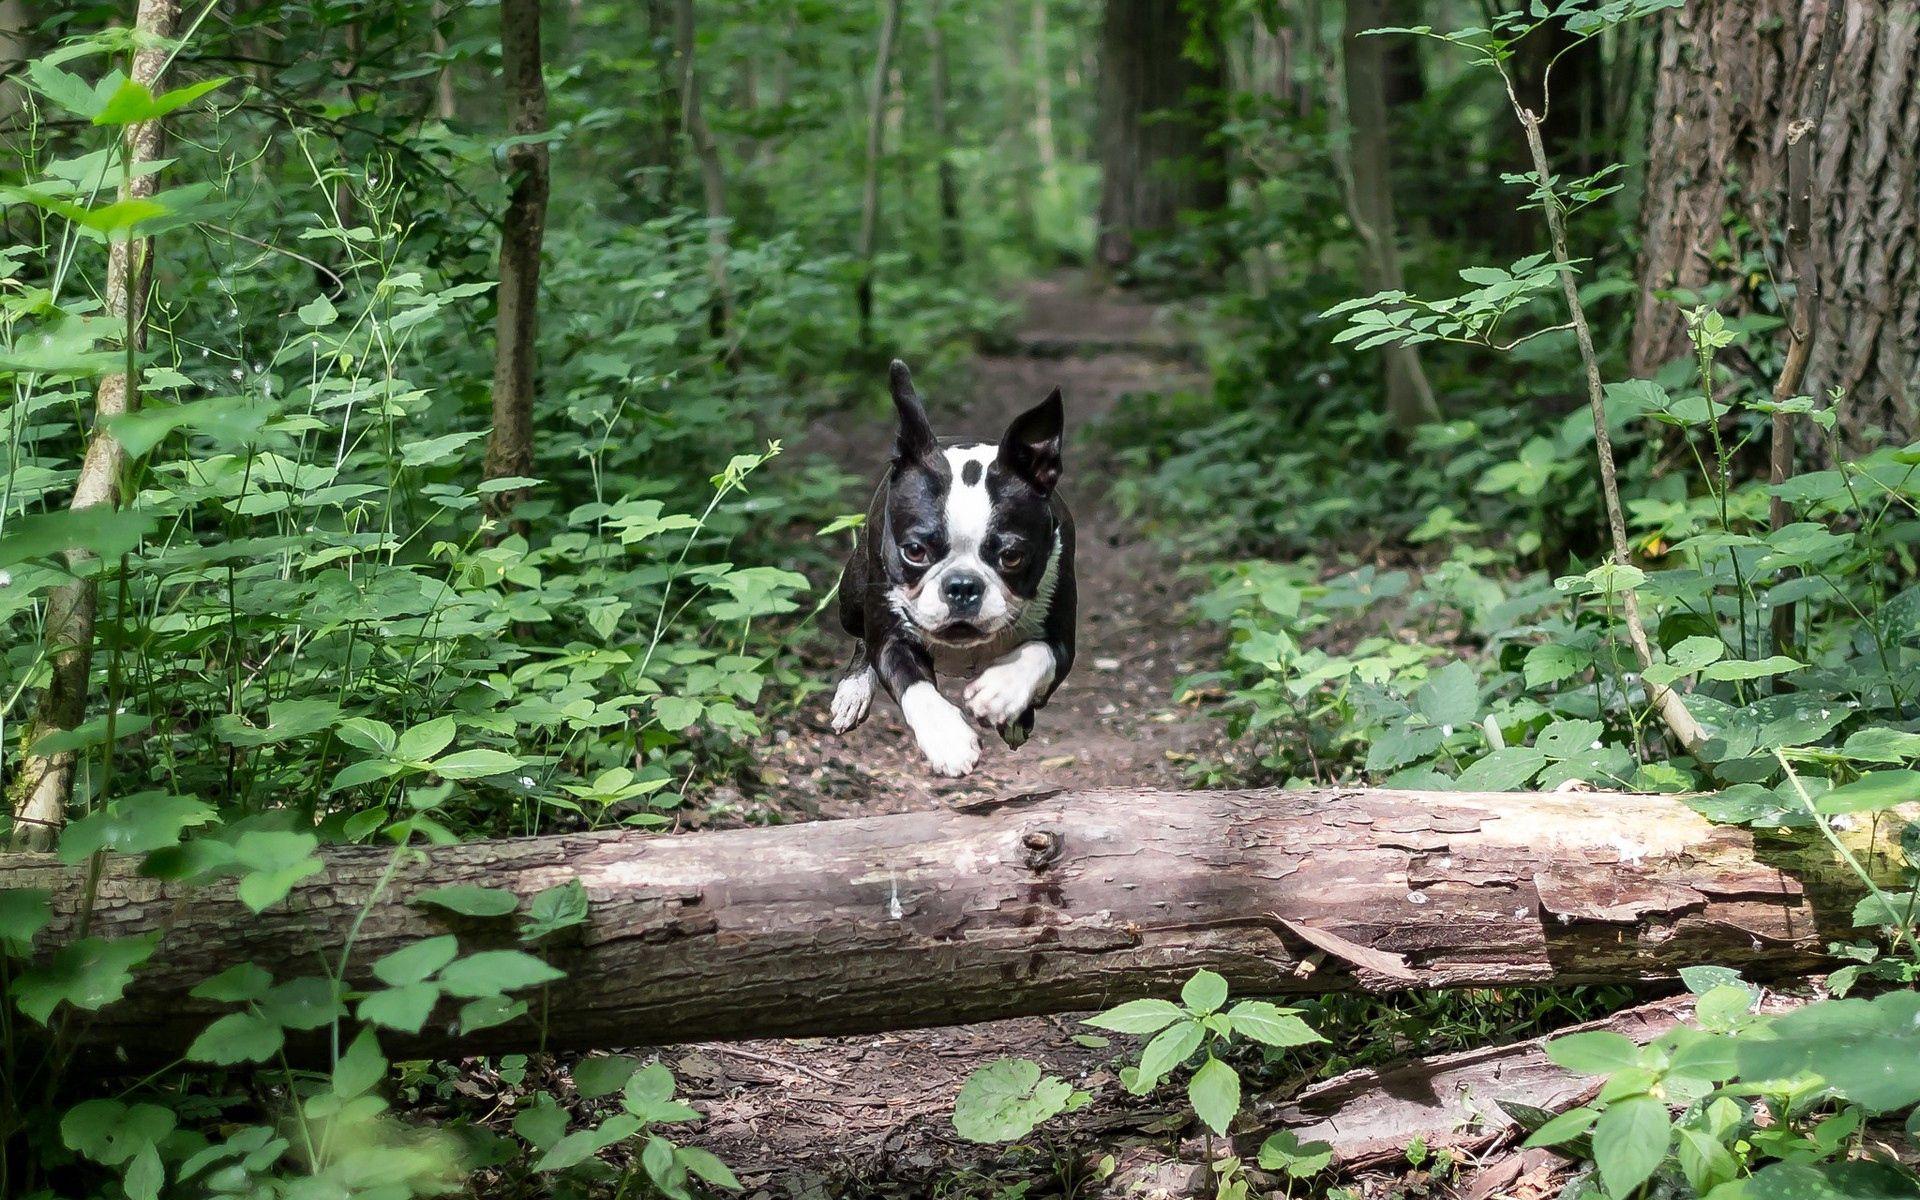 105088 download wallpaper Animals, Dog, Bulldog, Run Away, Run, Bounce, Jump screensavers and pictures for free